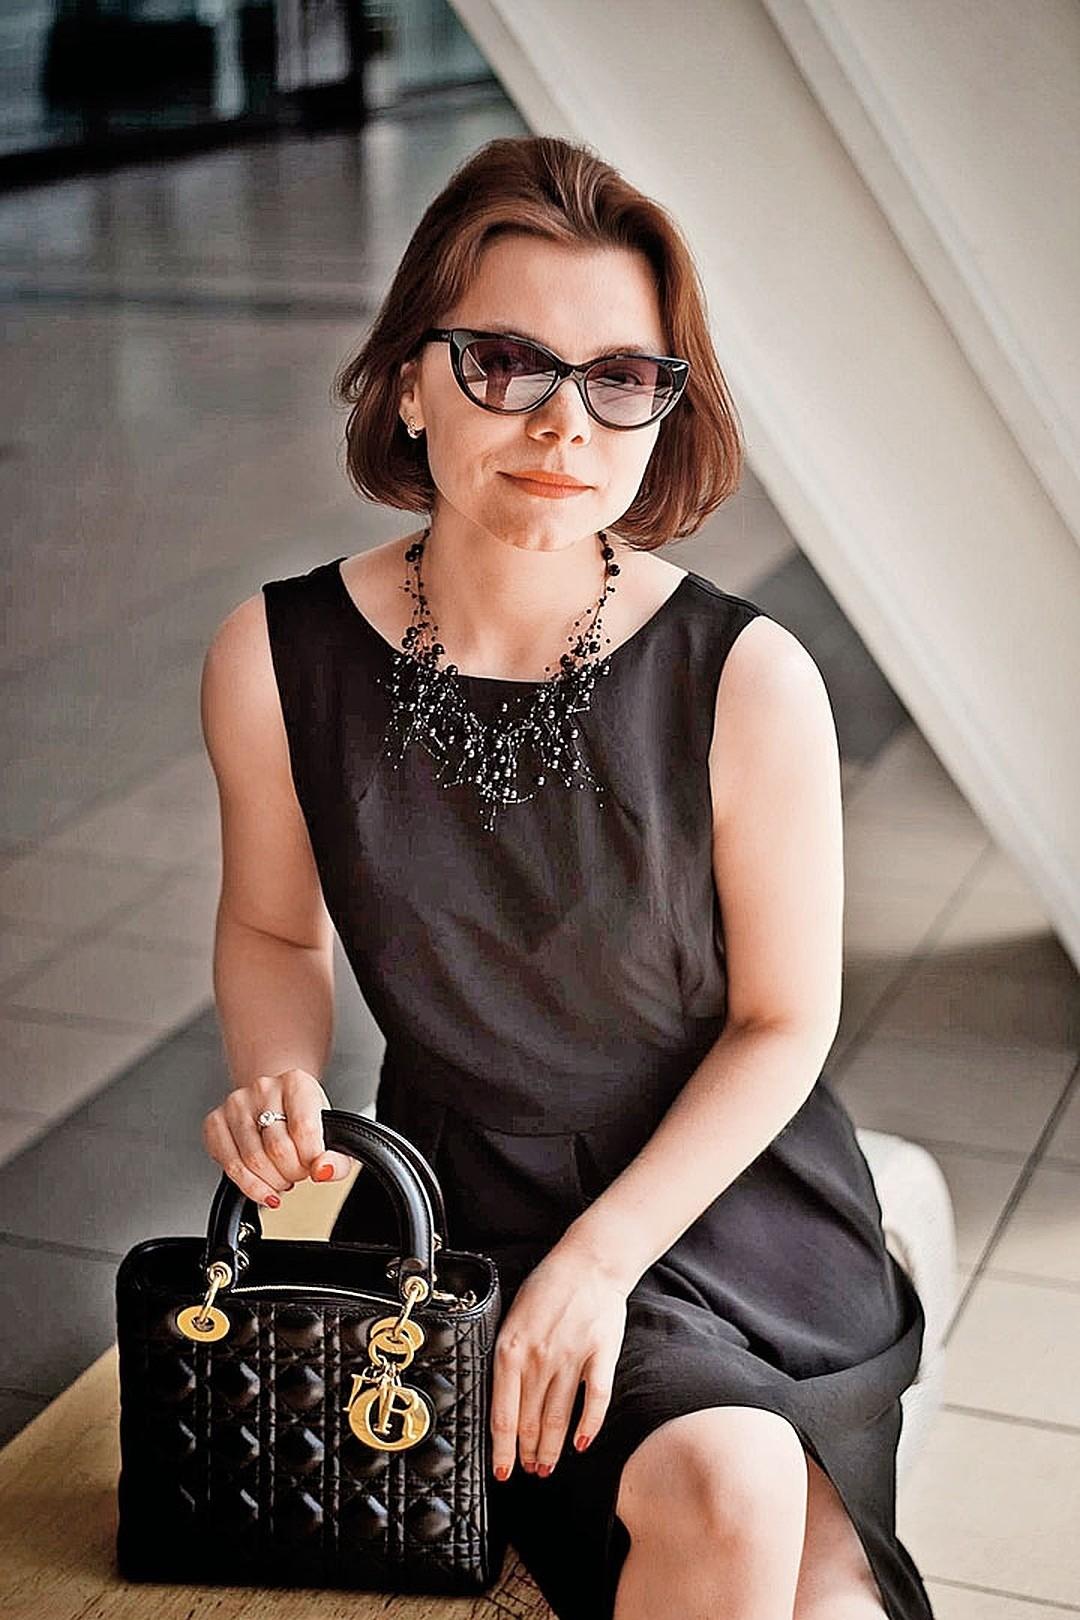 Сумочка Dior за 260 тыс. руб.